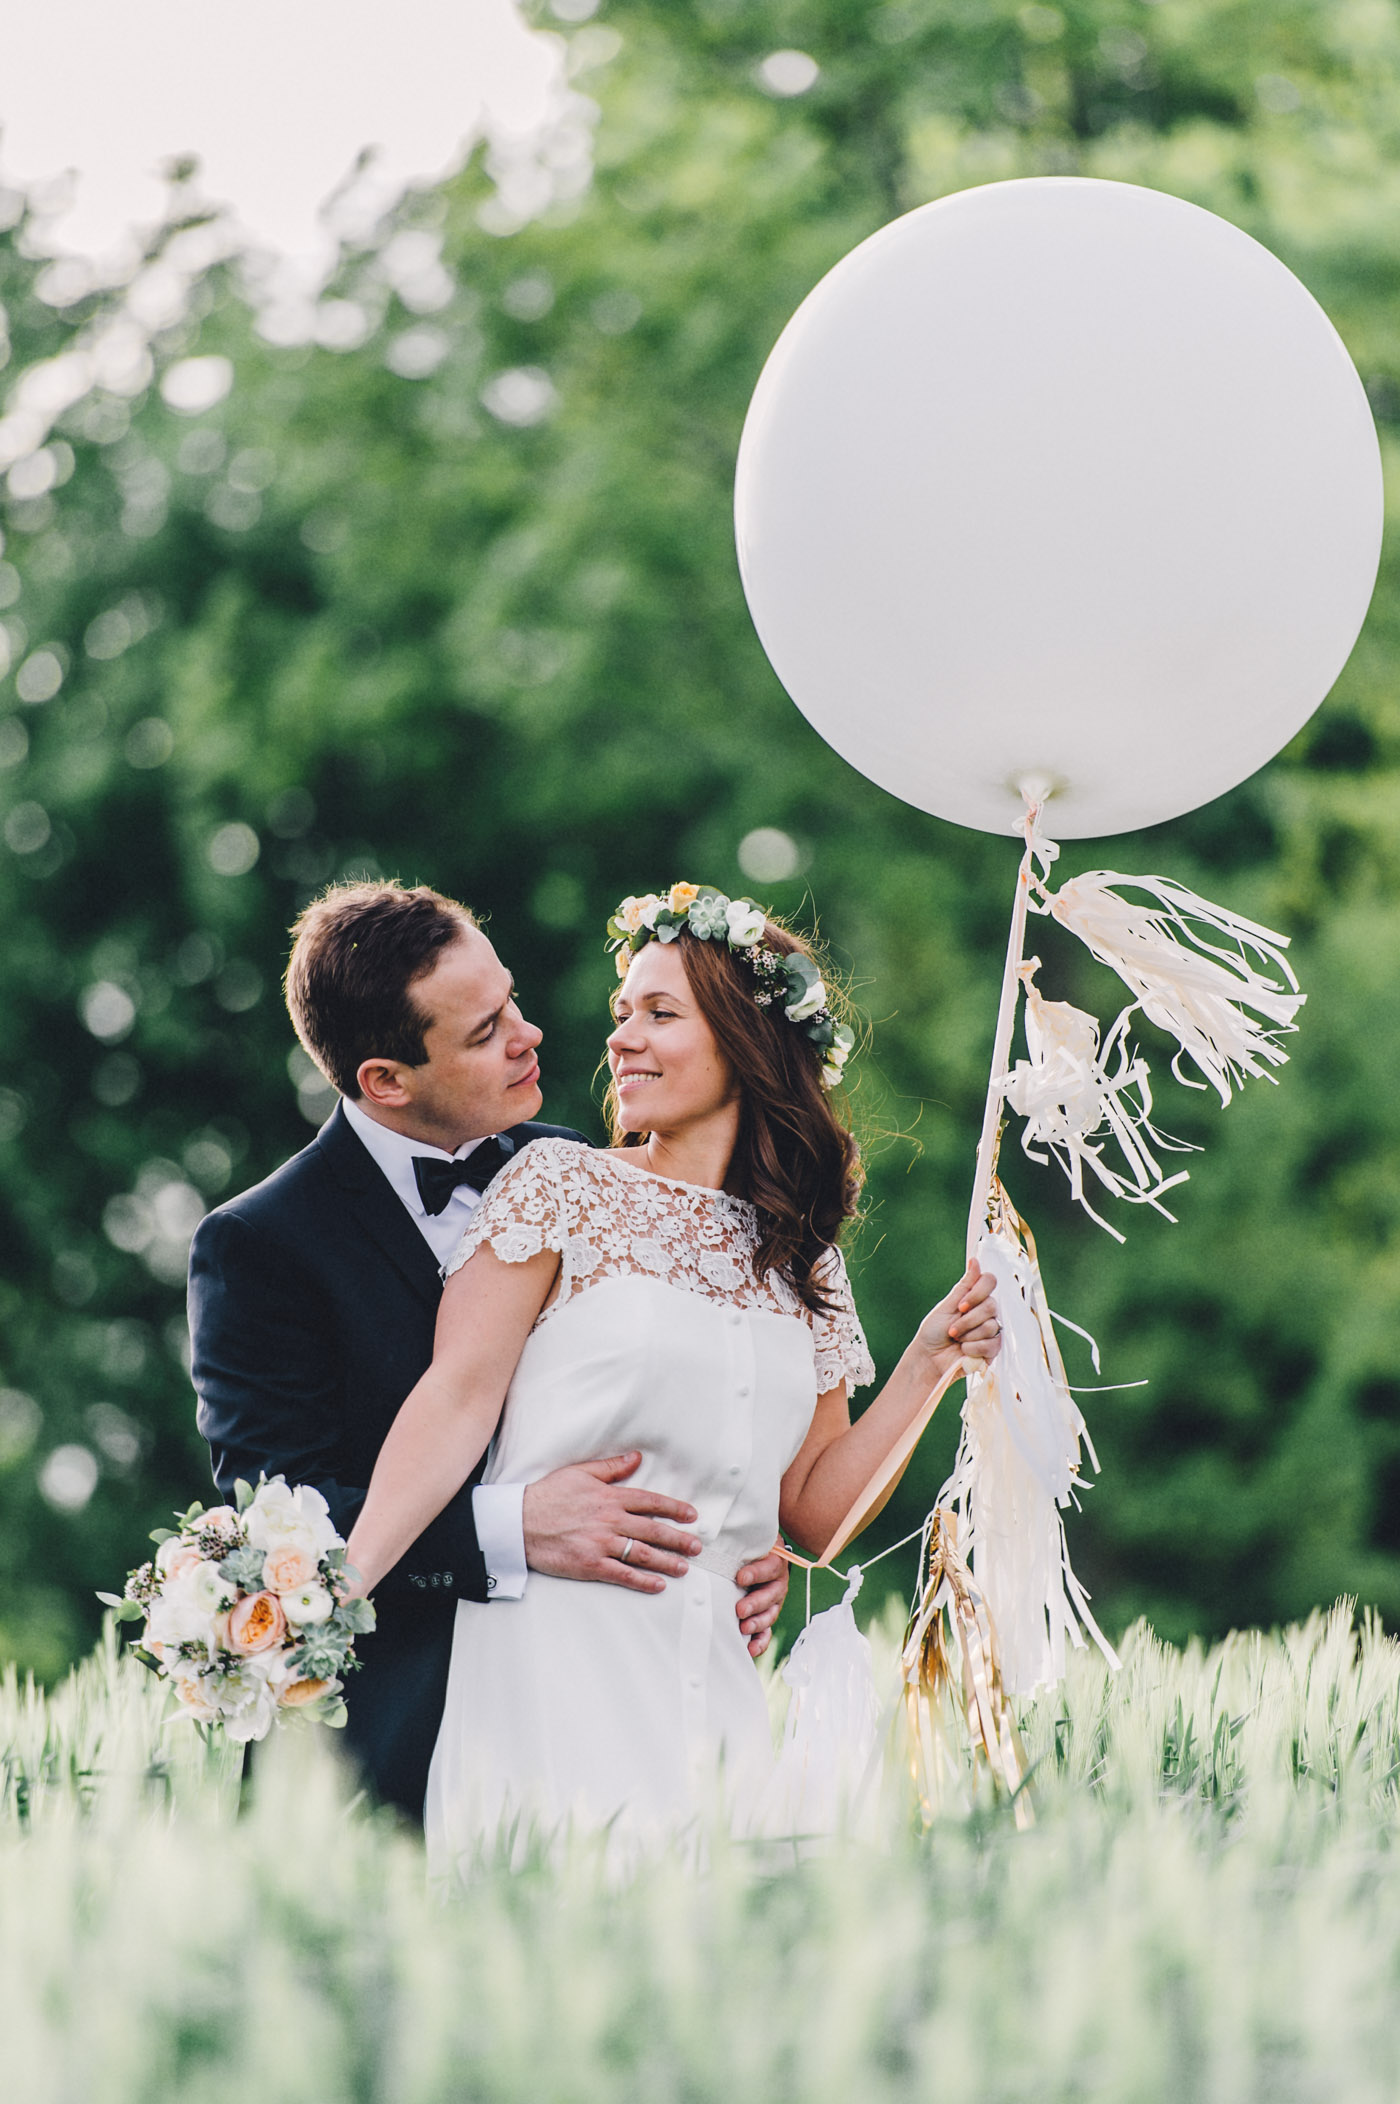 diy-wedding-nothenhof-hoch-7